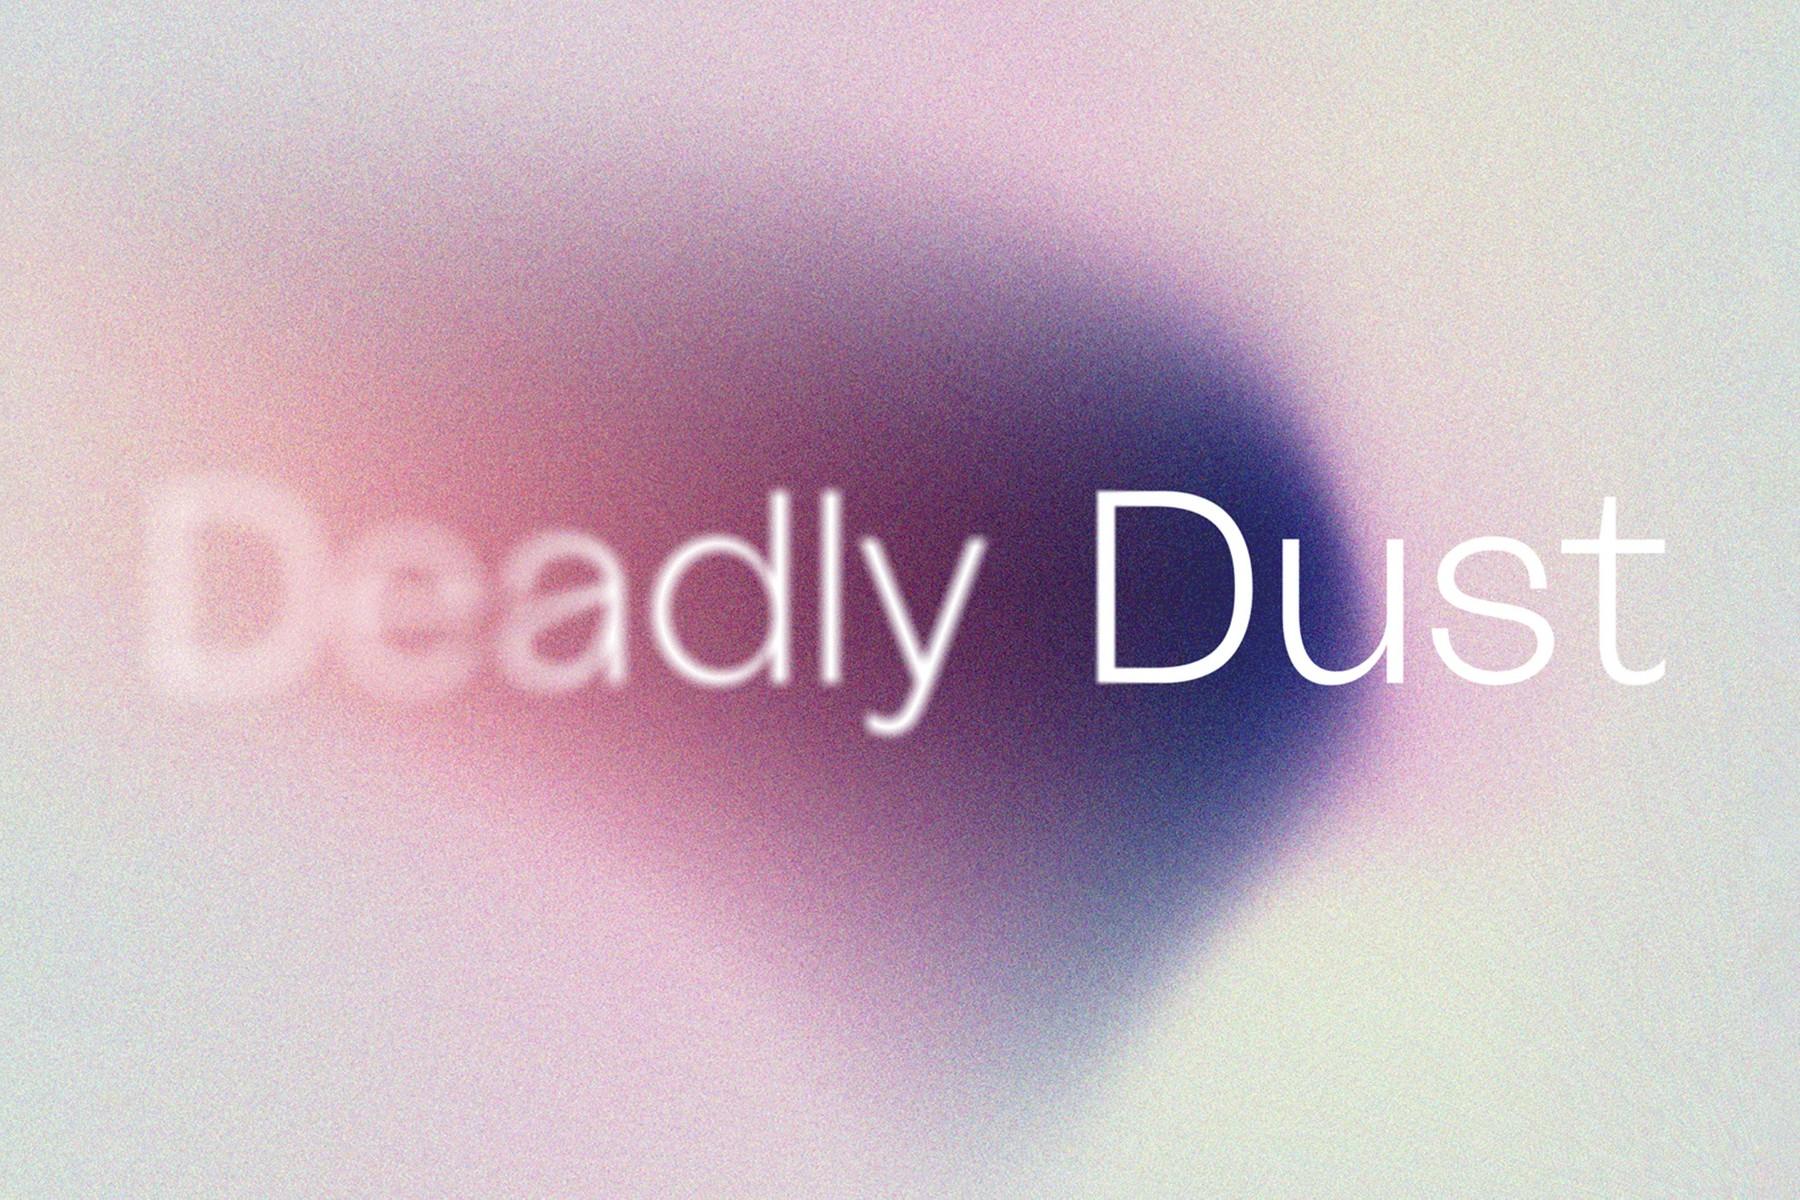 deadlydust_6.jpg